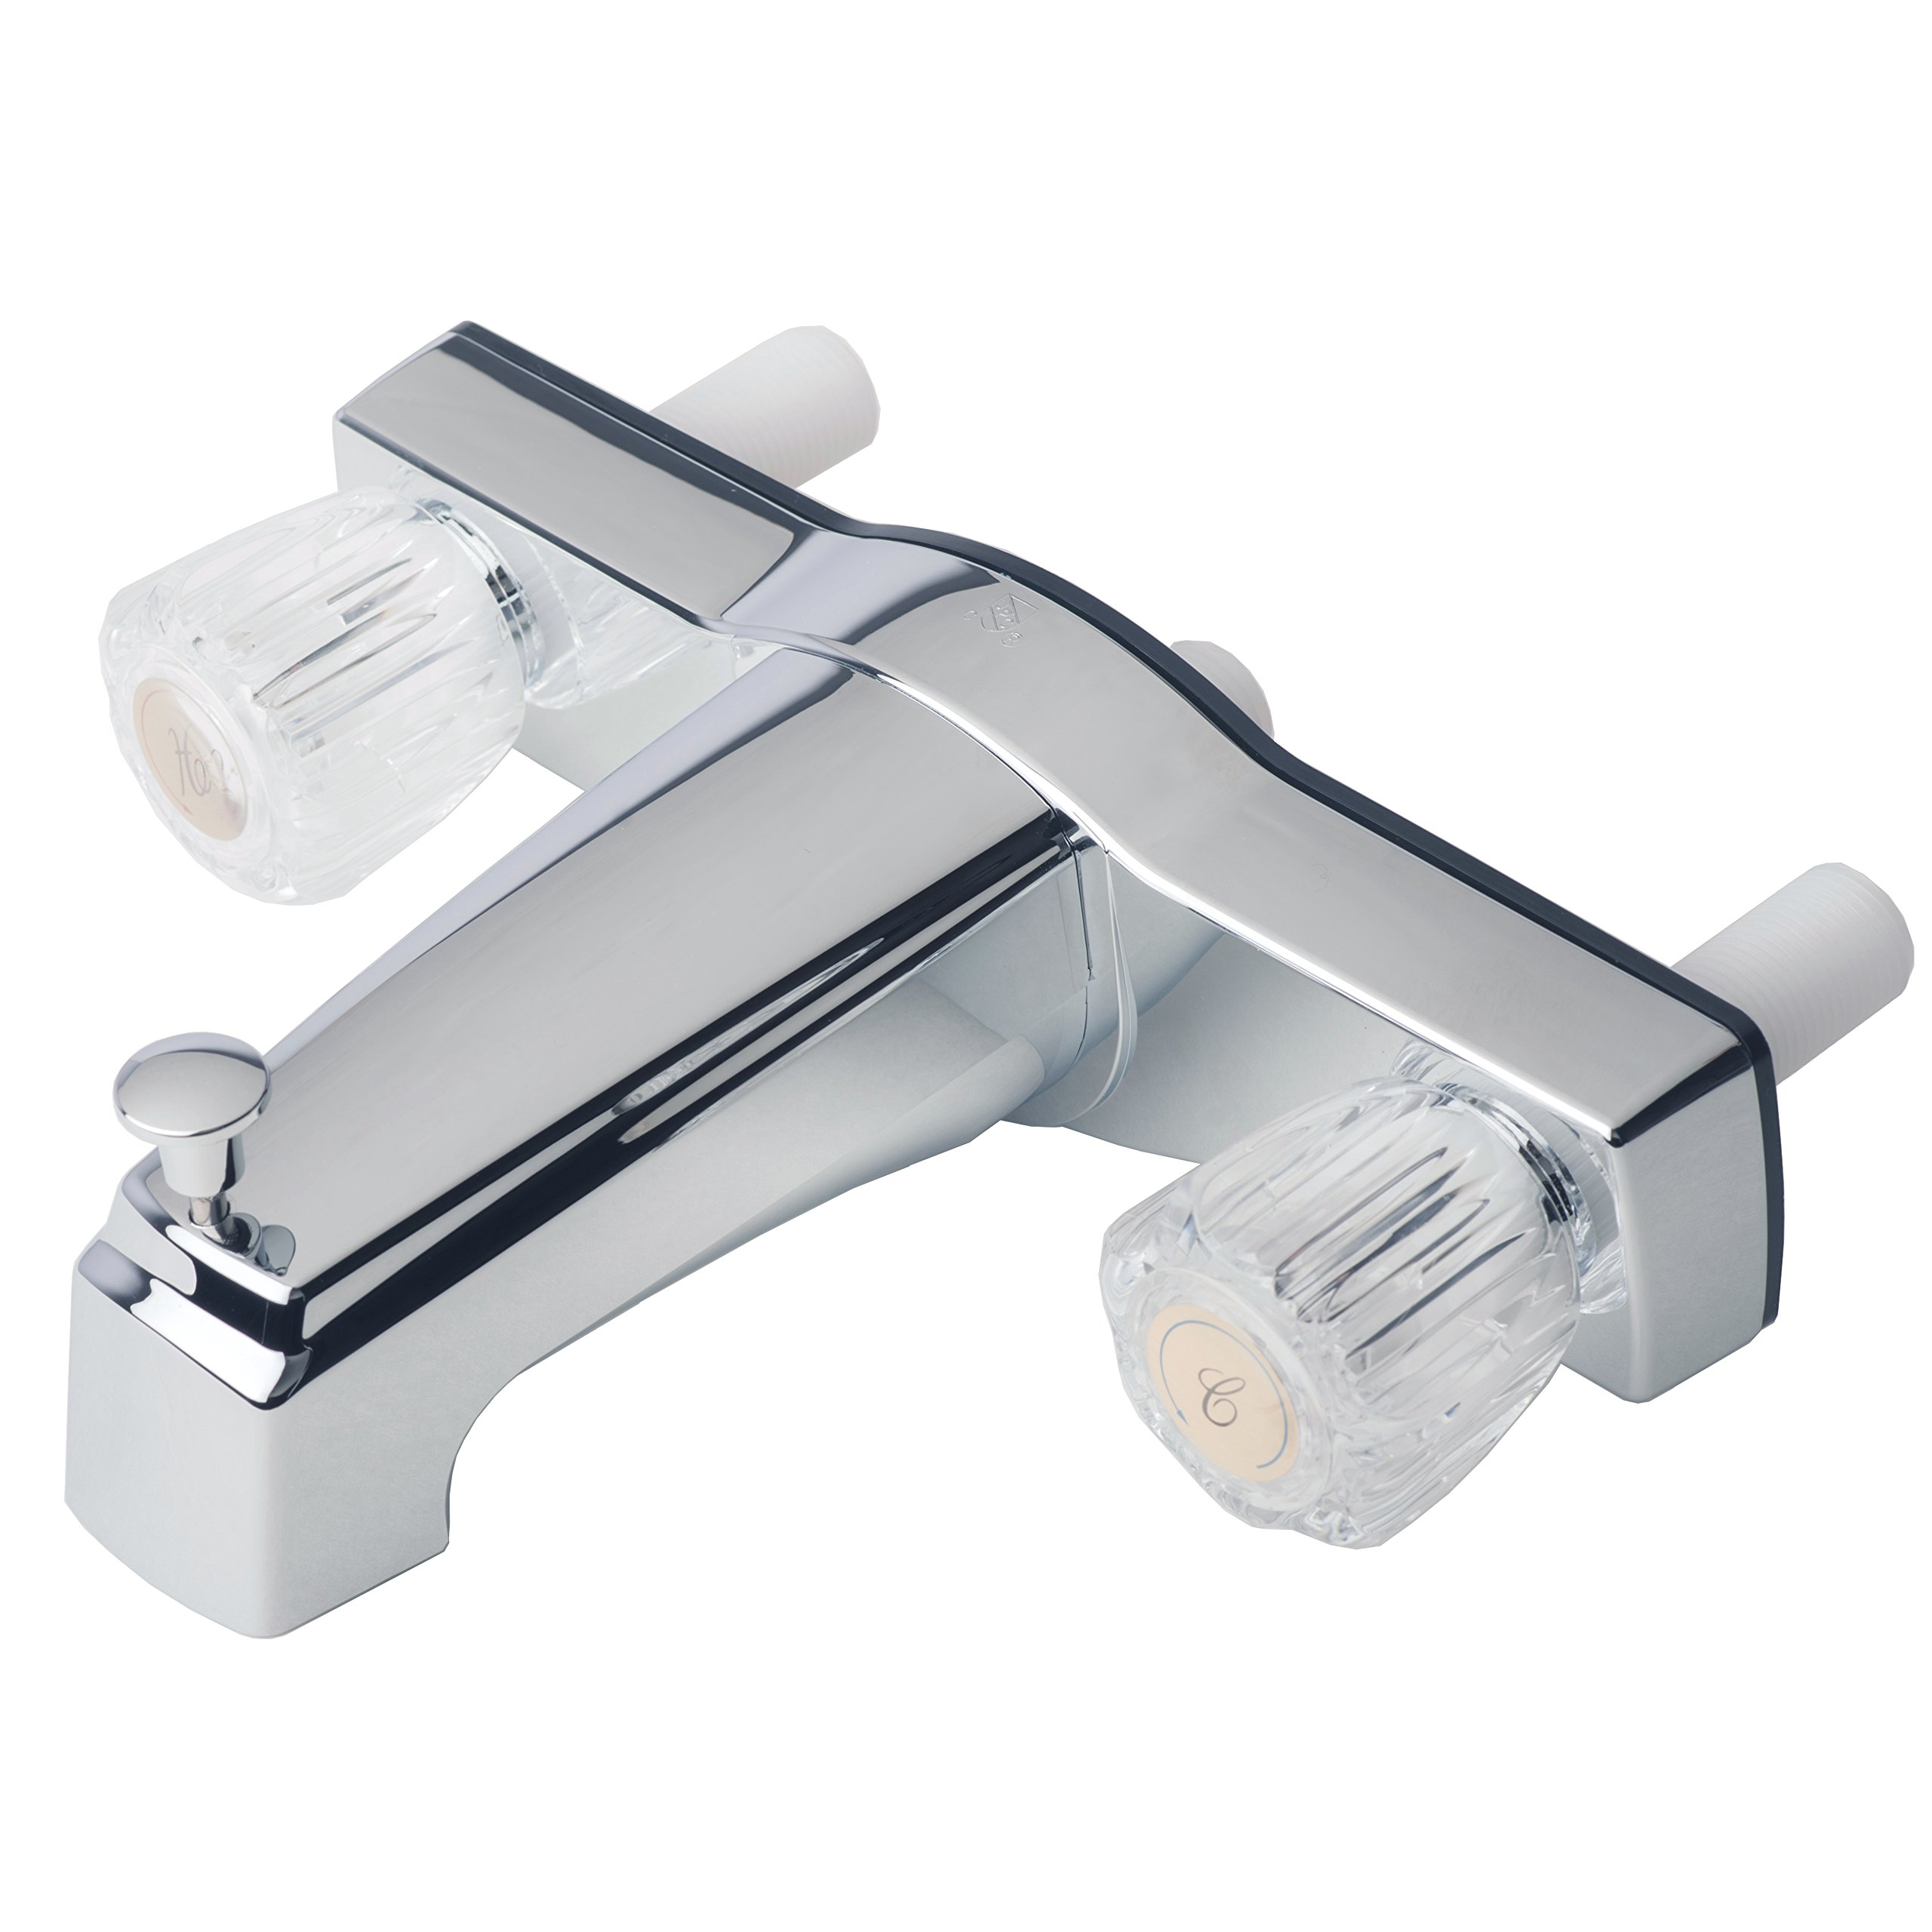 Builders Shoppe 3310ACP Mobile Home Two Handle Non-Metallic 8'' Tub Shower Diverter Chrome Finish